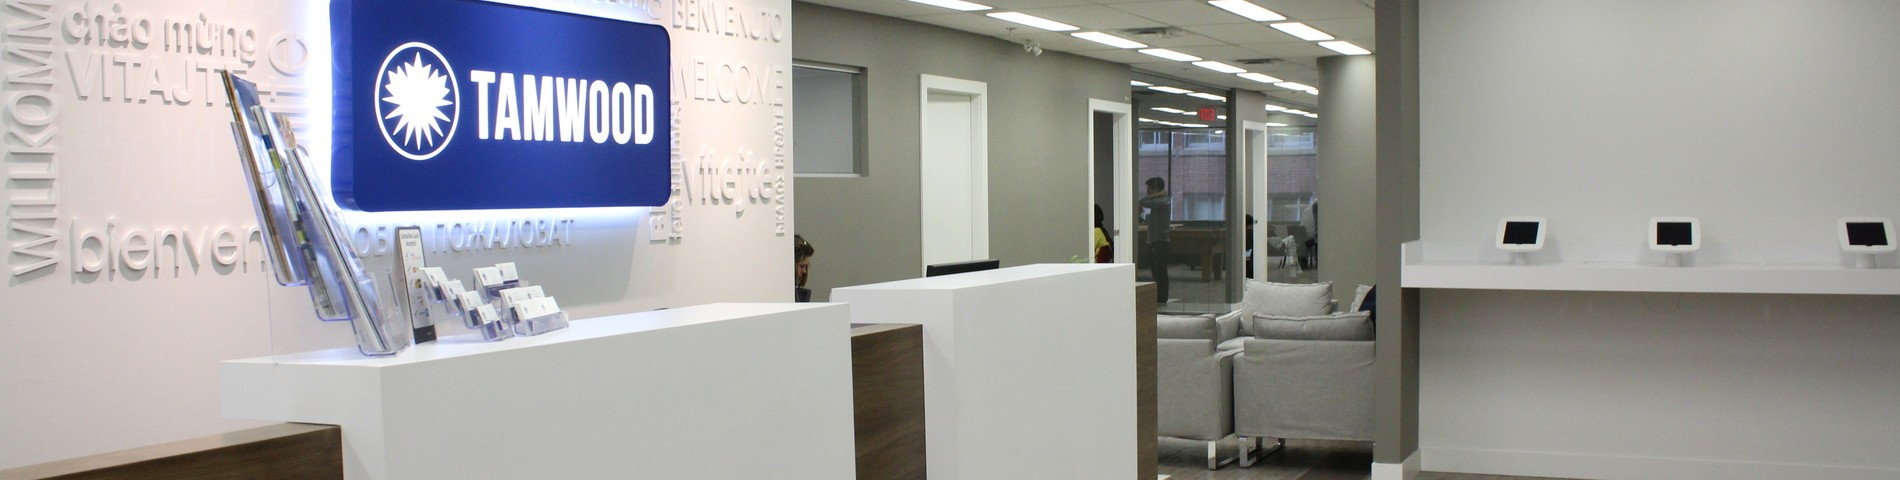 Tamwood Language Centre Bild 1